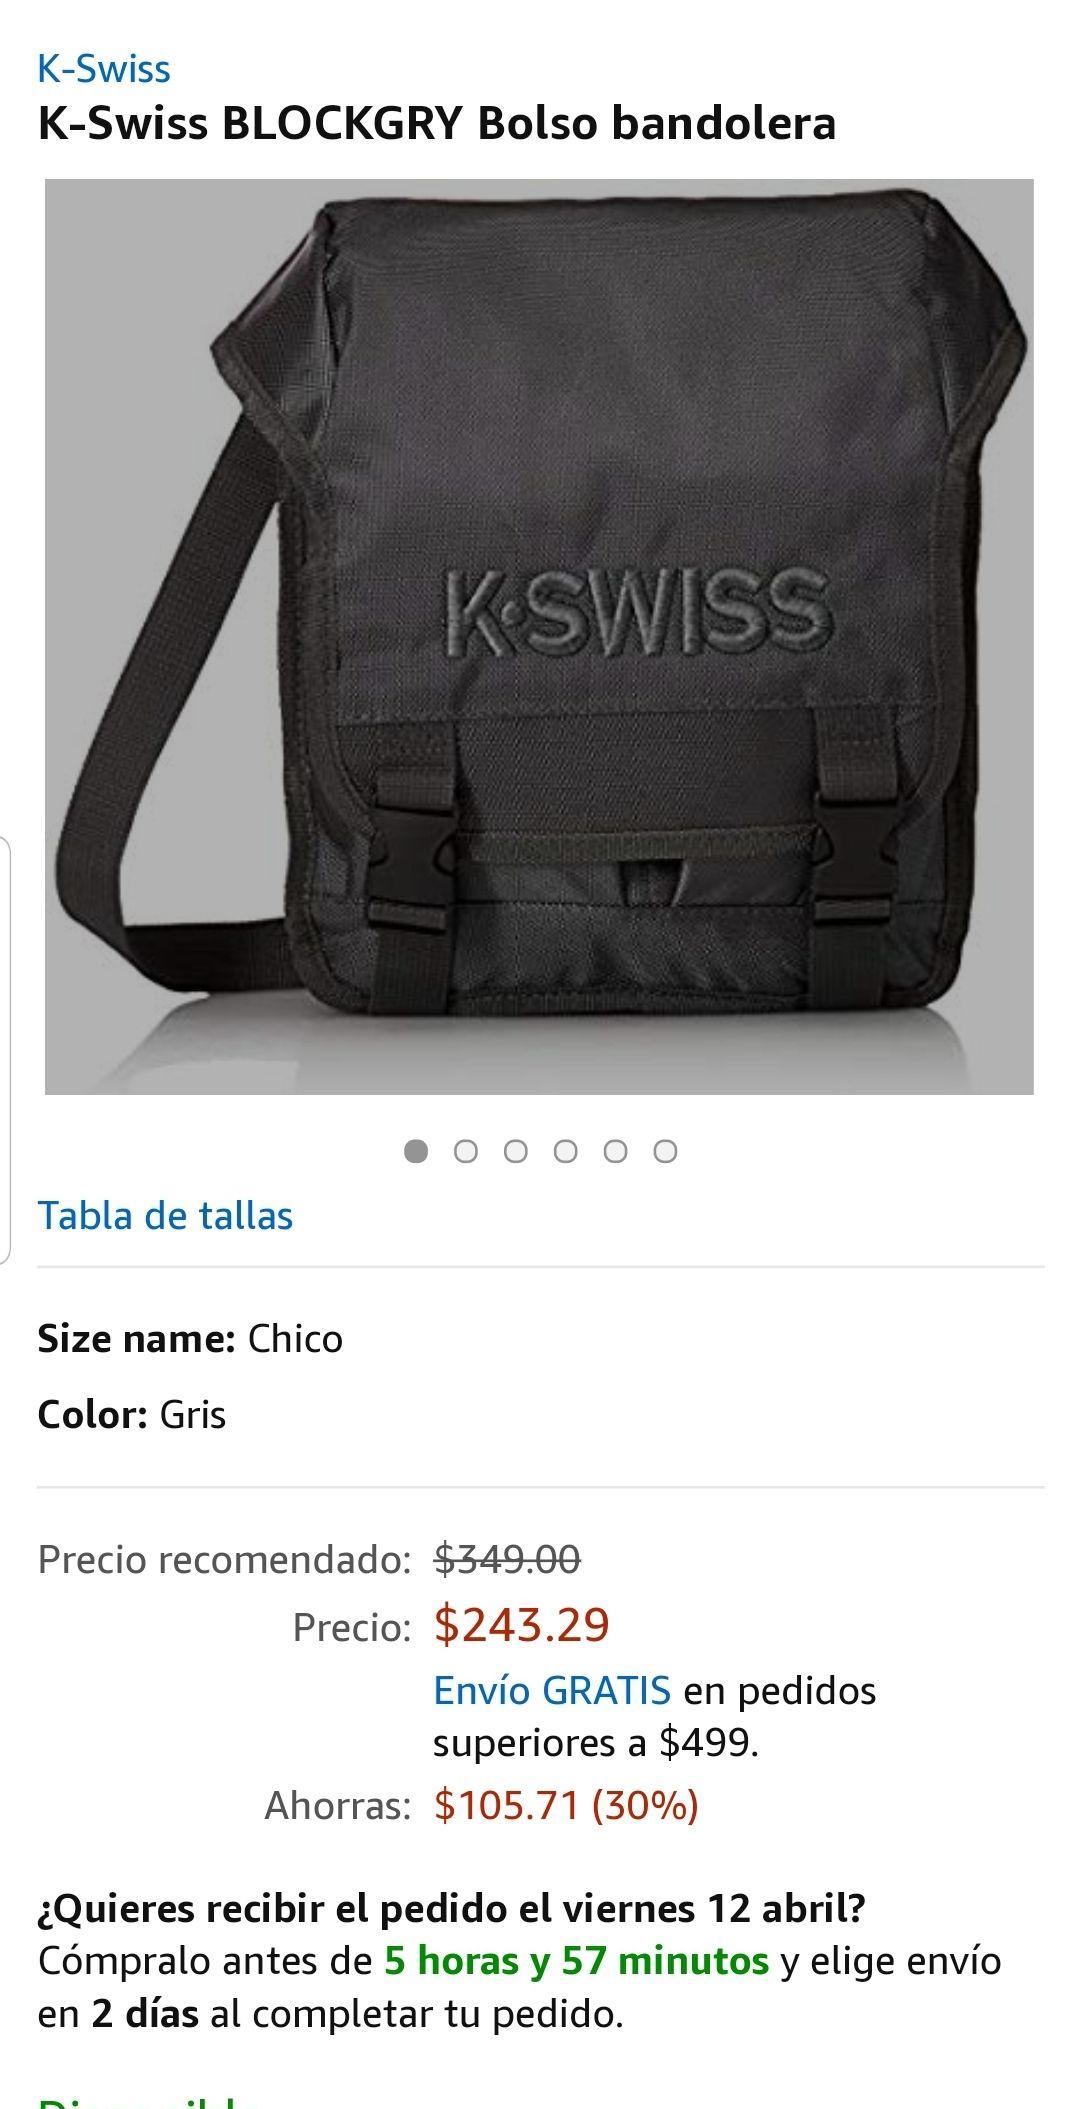 44c700305 Amazon: K-Swiss BLOCKGRY Bolso bandolera - promodescuentos.com